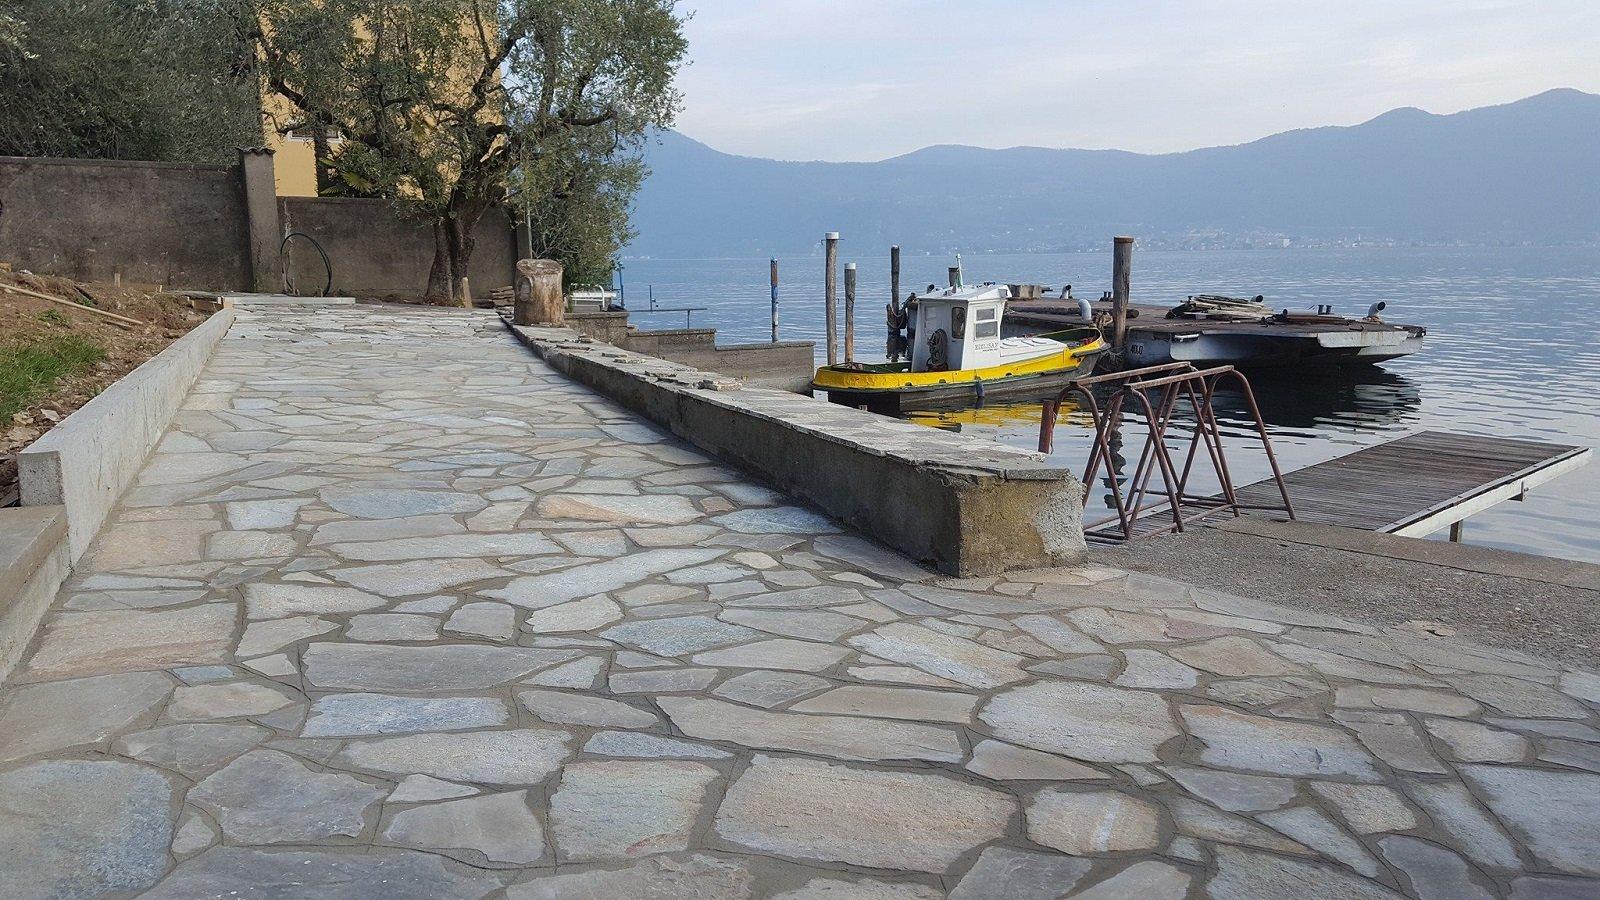 un pavimento in pietra accanto a un molo